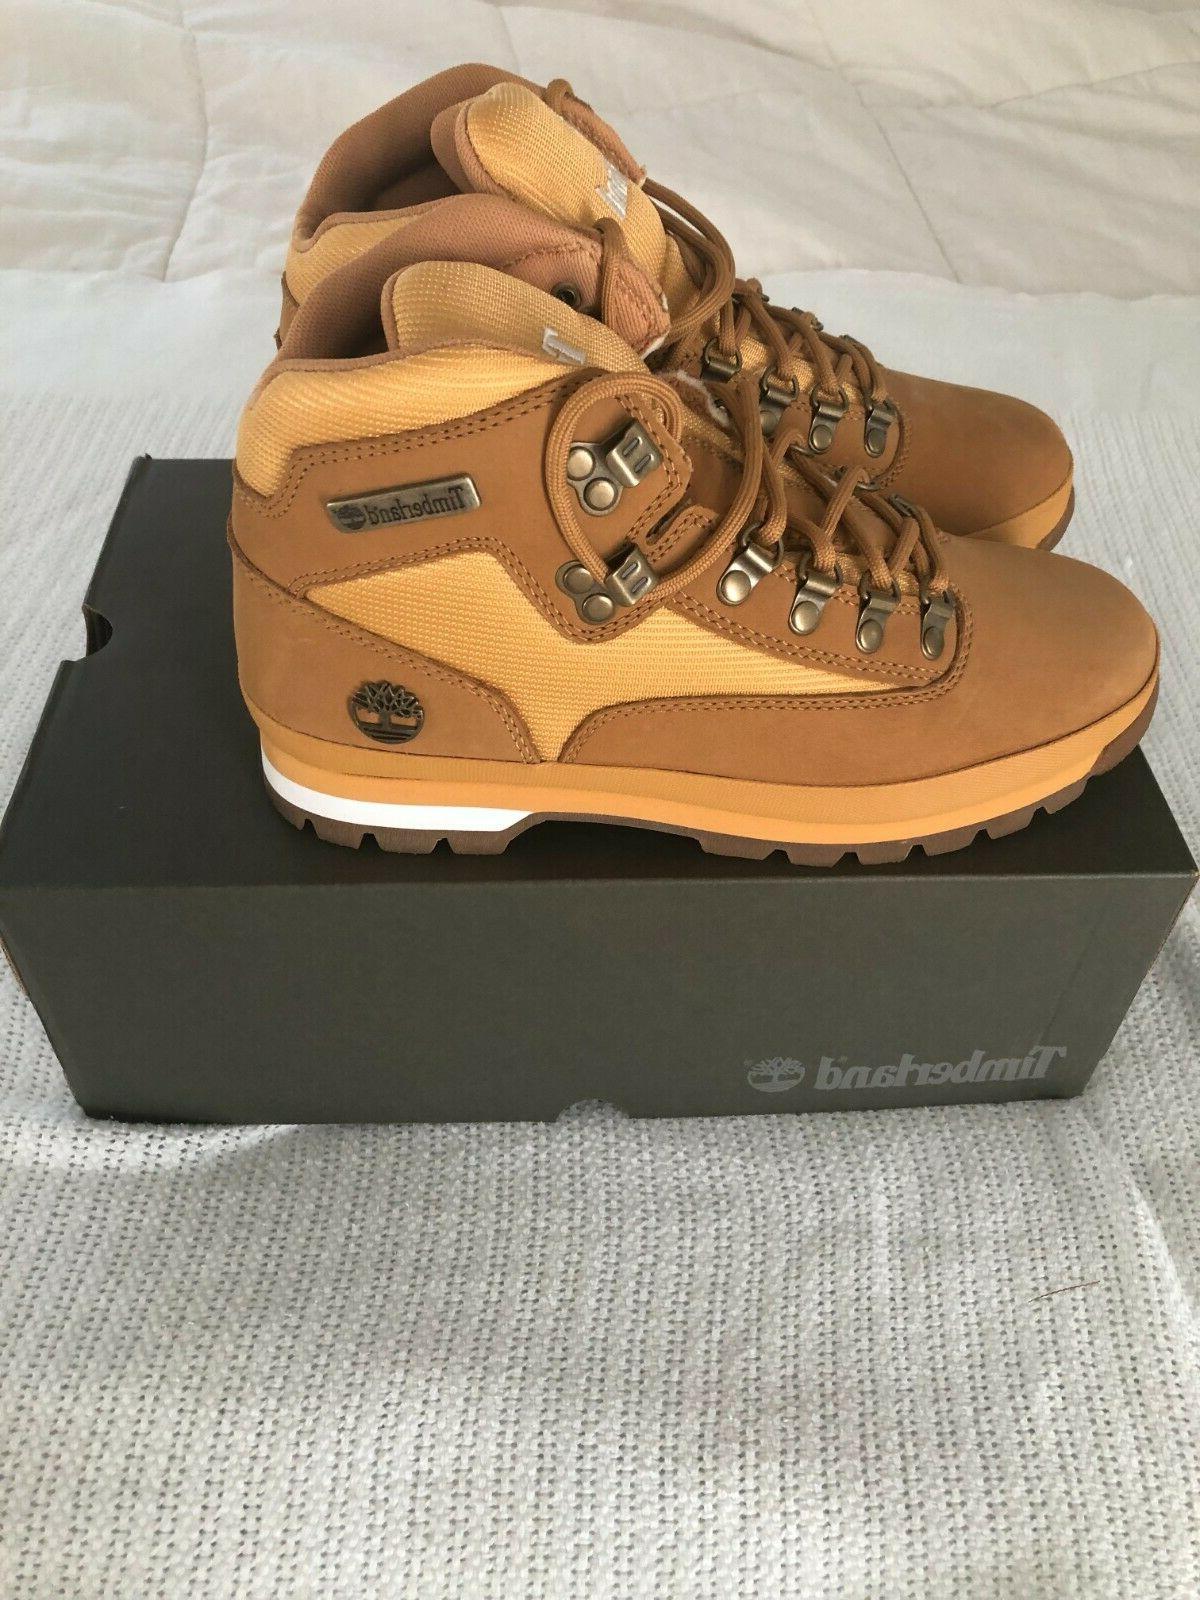 Timberland BOOTS TB091566-231 Shoe Size